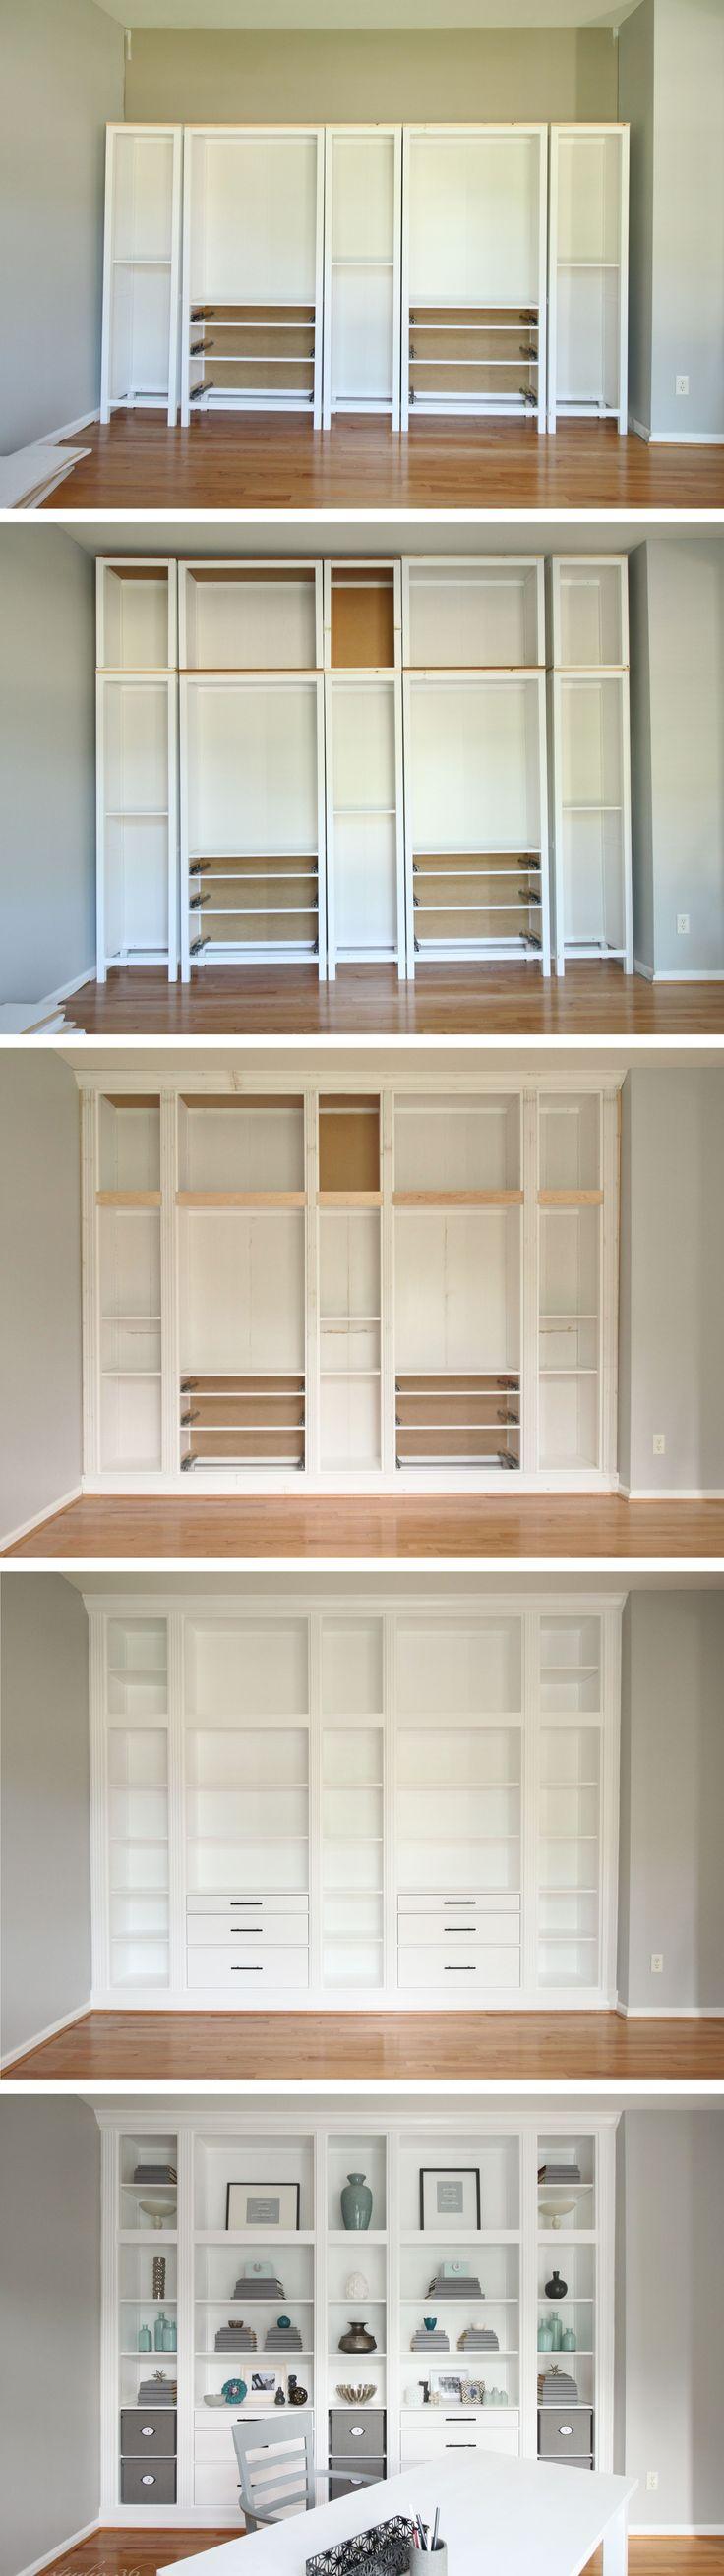 DIY Built-in Bookcases made with Ikea Hemnes Furniture, Custom Built-in Storage, Ikea Hack | Studio 36 Interiors #DIYHomeDecorIkea